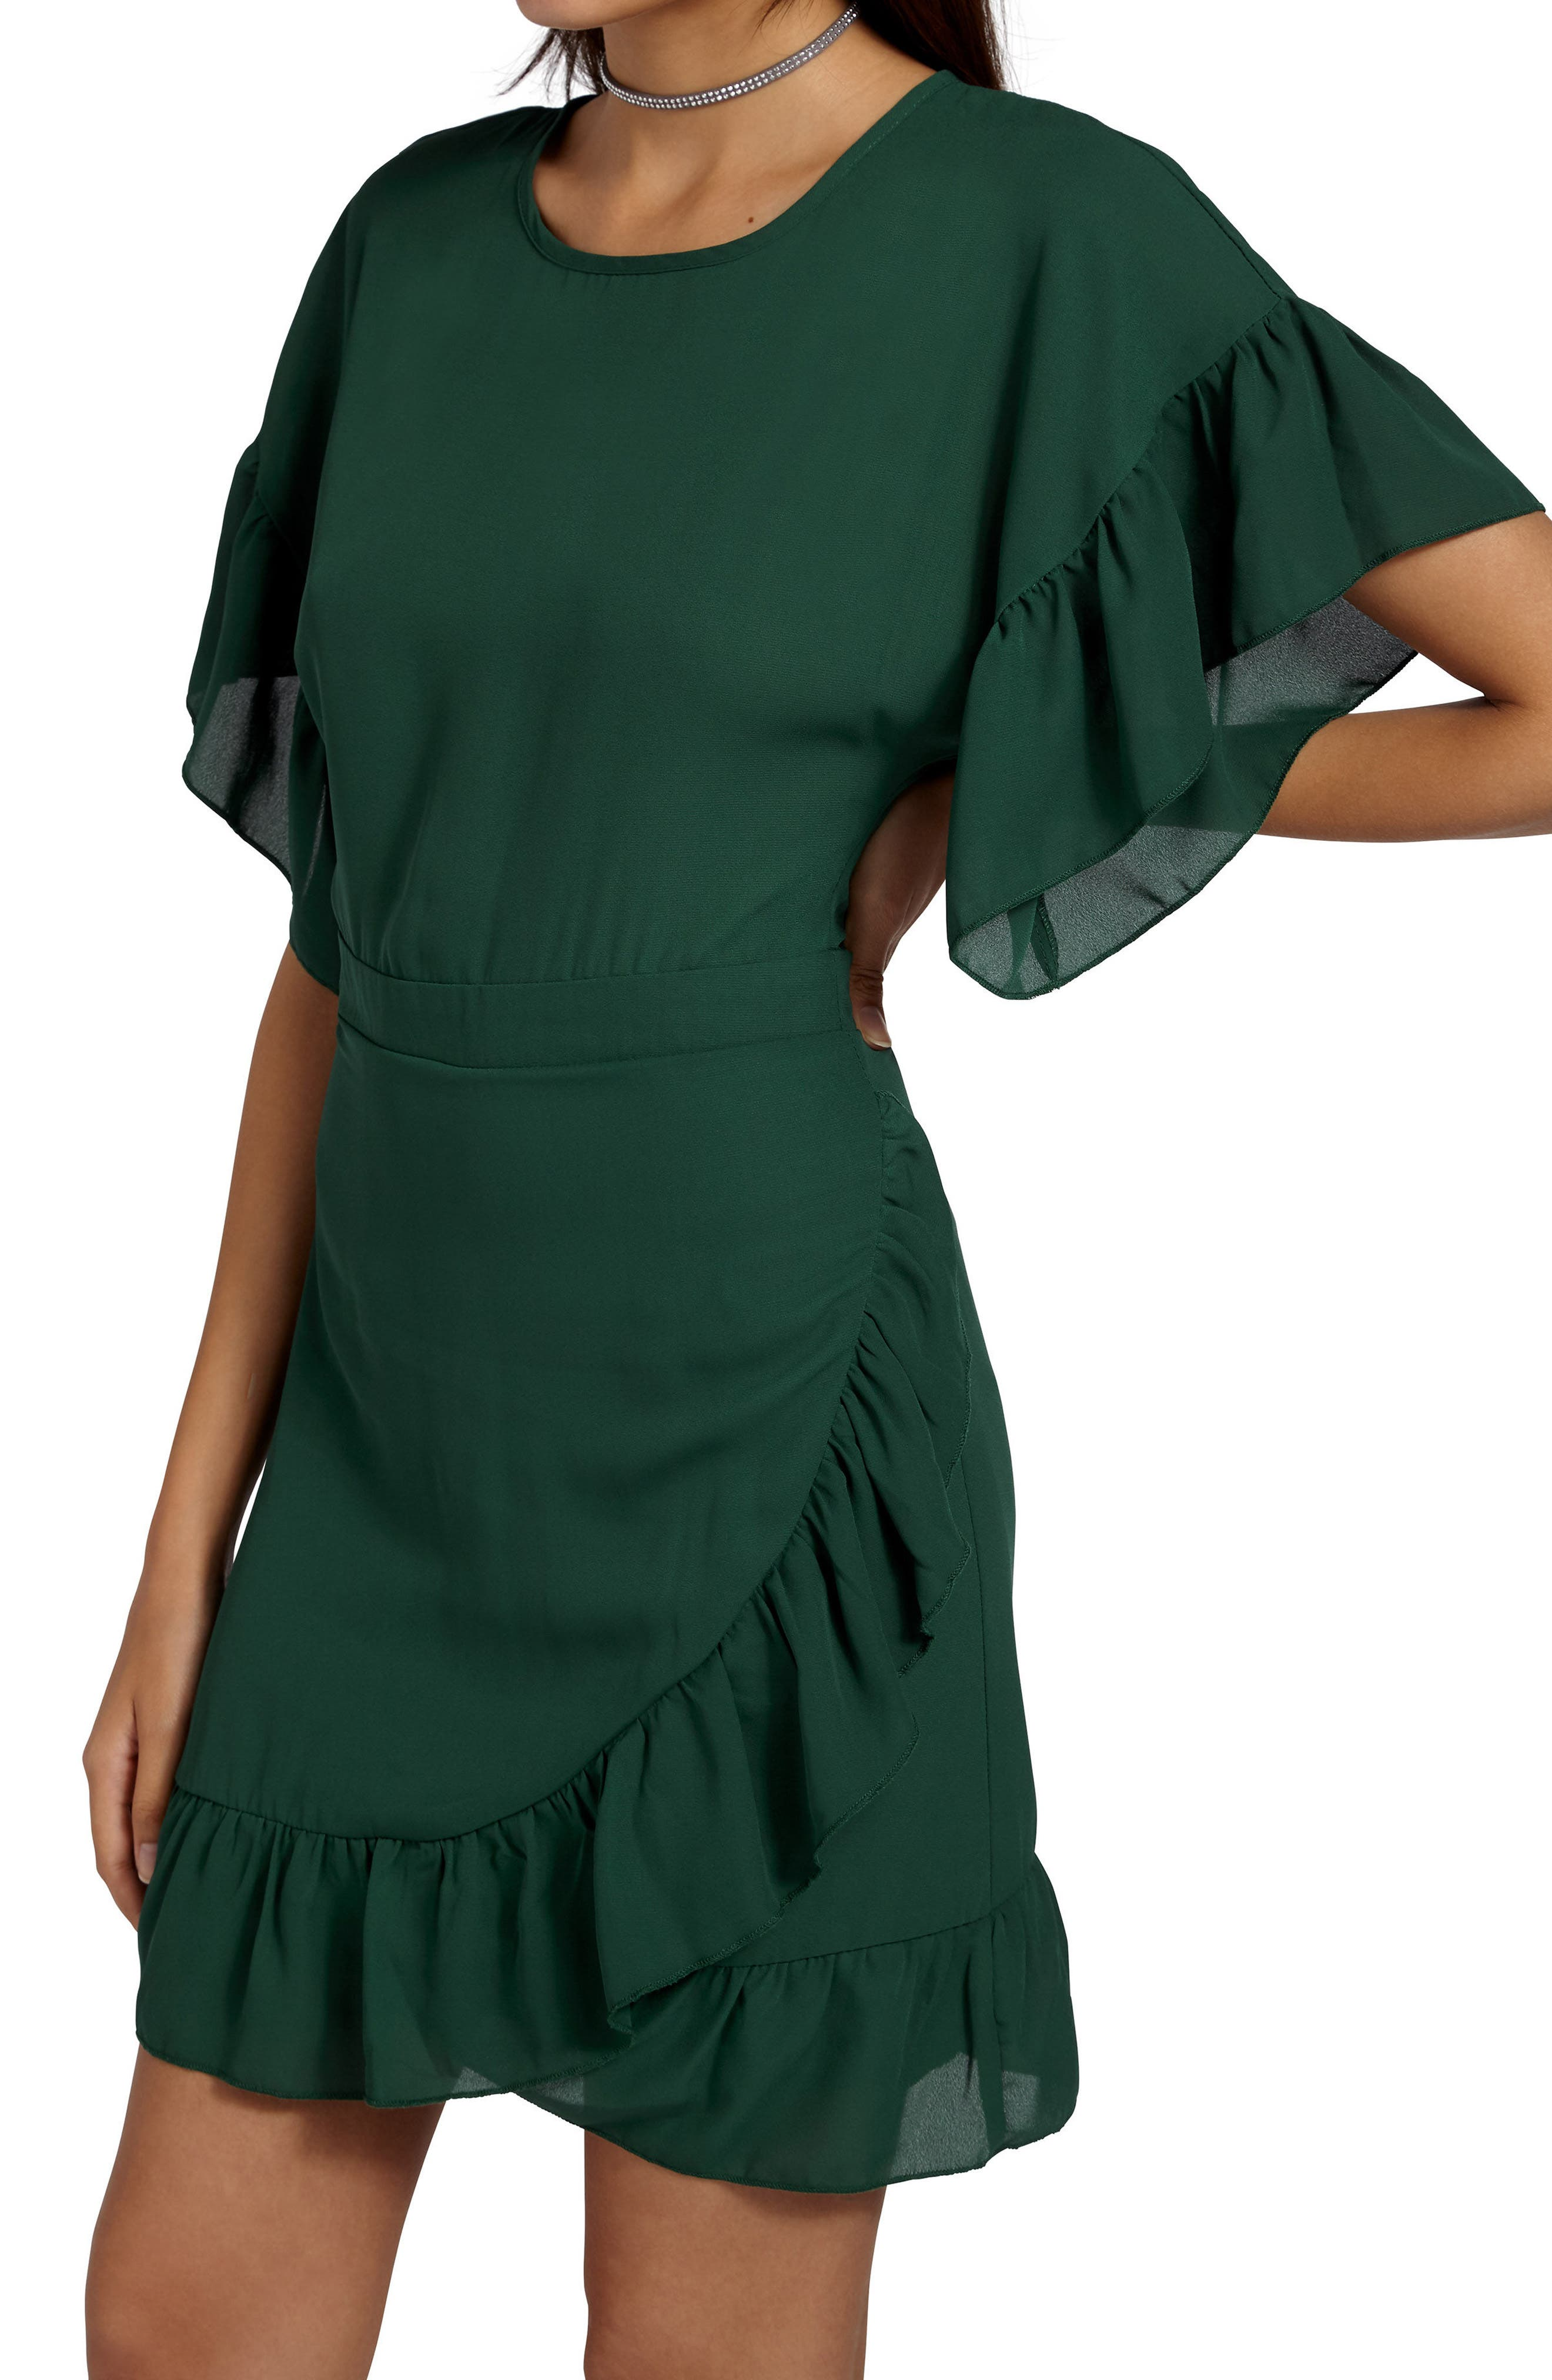 Ruffle Chiffon Sheath Dress,                             Alternate thumbnail 4, color,                             300